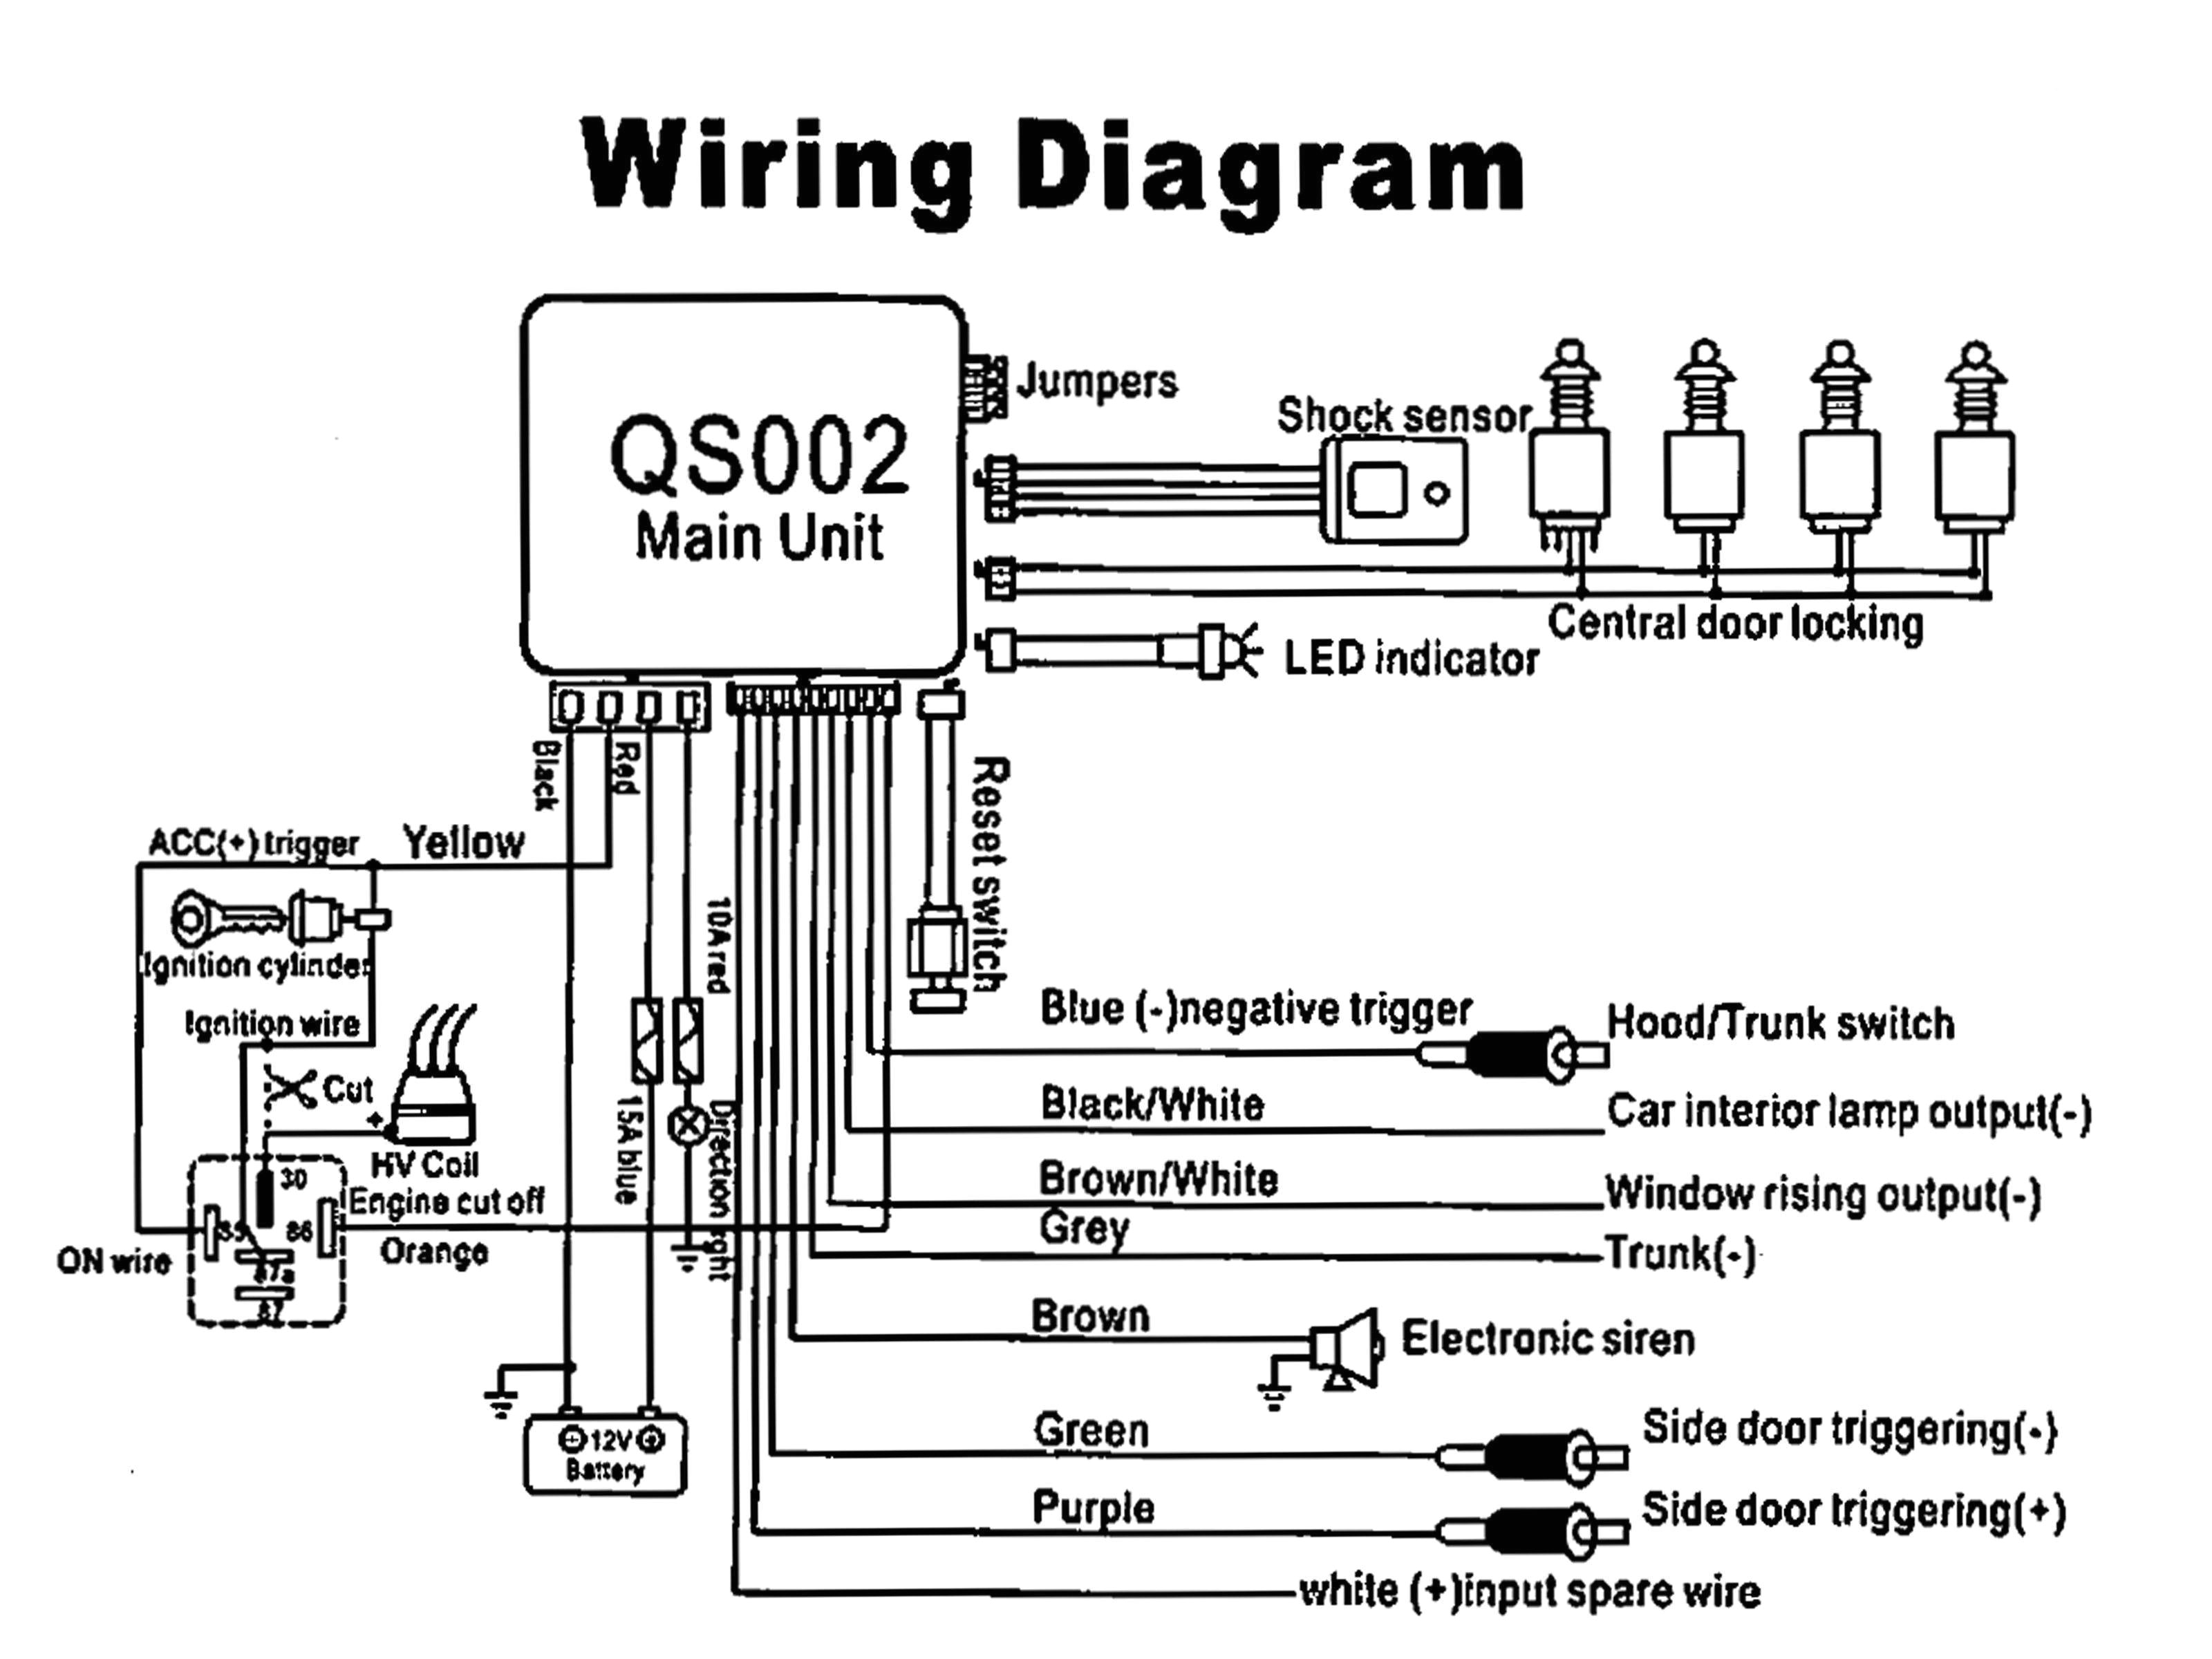 scorpion car alarm wiring diagram wiring diagram sch alarm wiring diagram wiring diagram for you scorpion